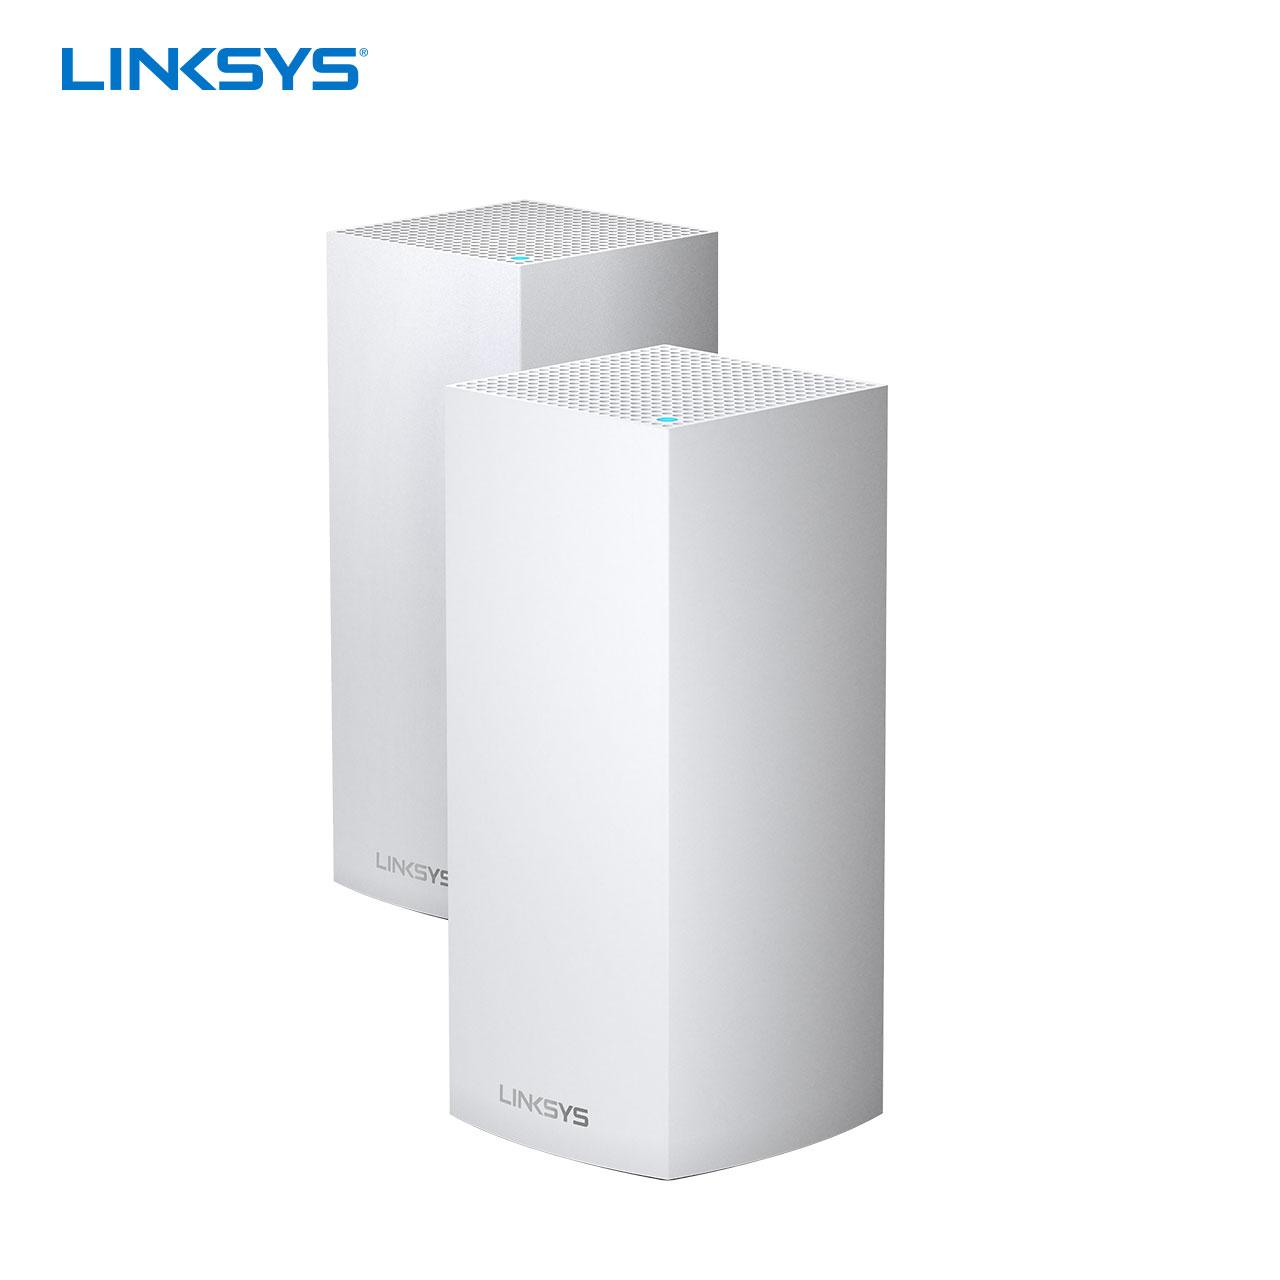 MX8400 分布式无线覆盖系统智能家用广覆盖穿墙强 MESH 路由器 WIFI6 三频全 VELOP 领势 LINKSYS